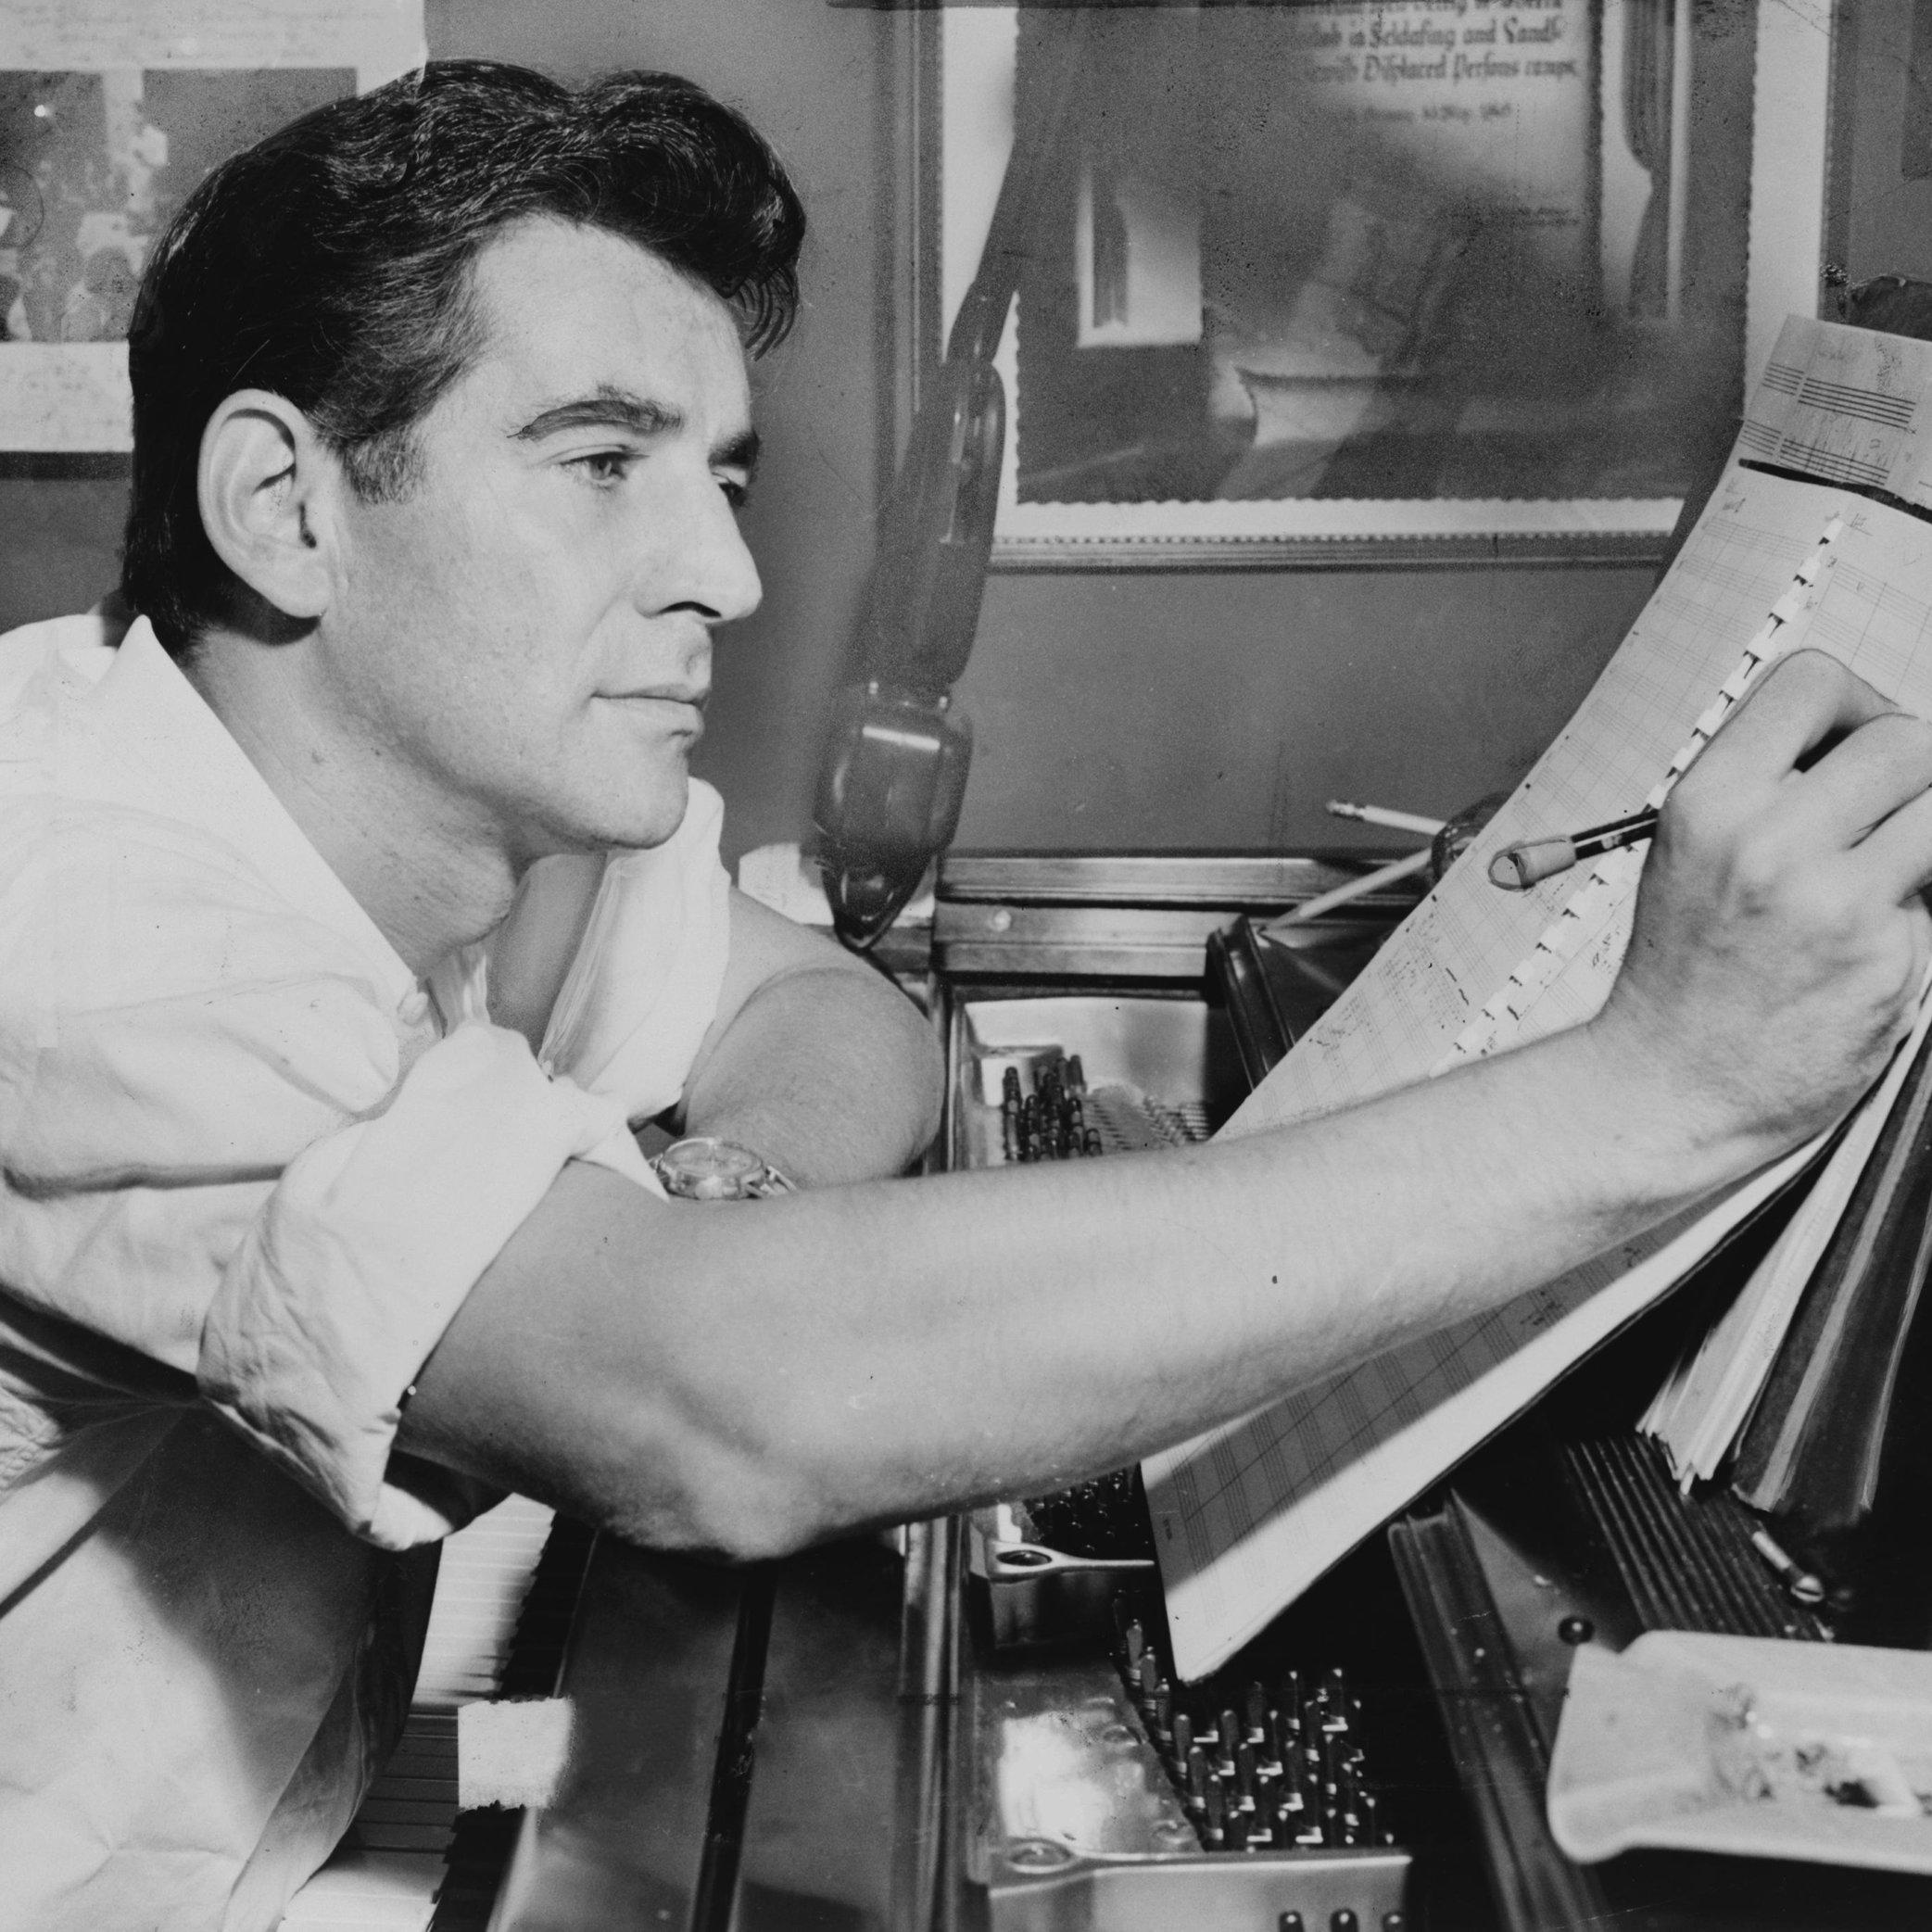 Leonard_Bernstein_NYWTS_1955.jpg